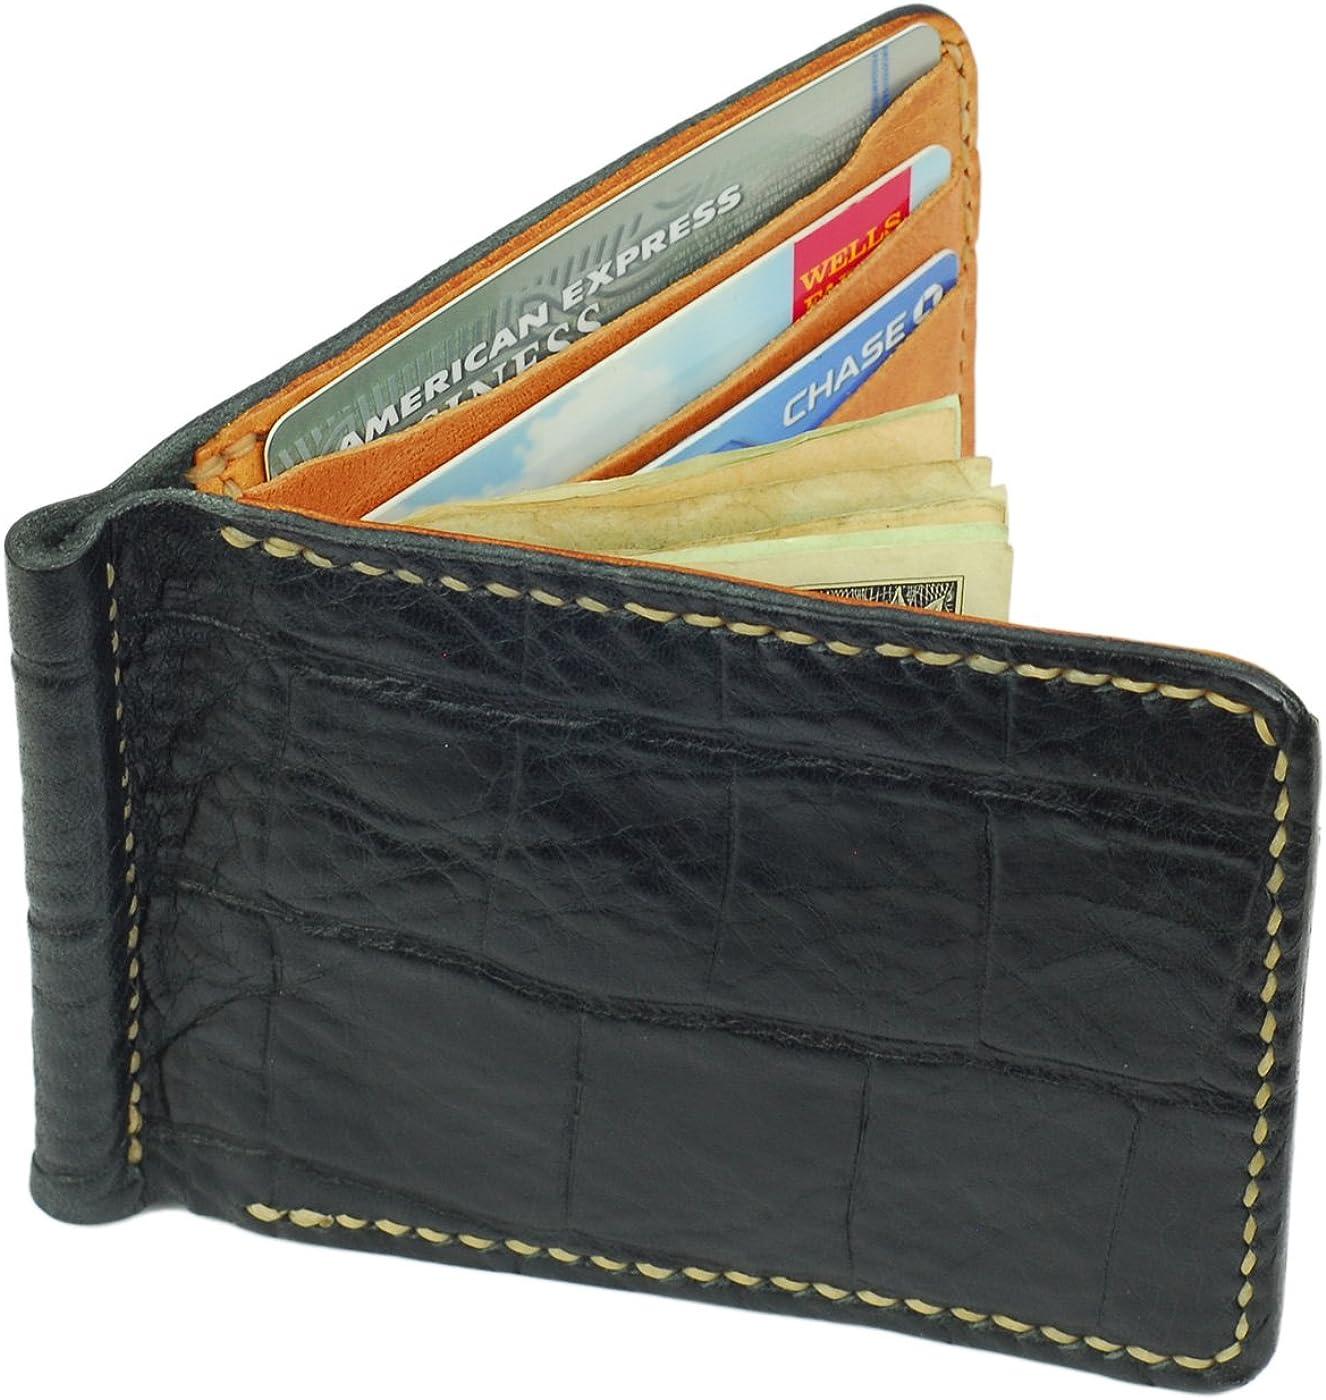 Leather Money Clip Wallet, Crocodile Grain, Black, Handmade